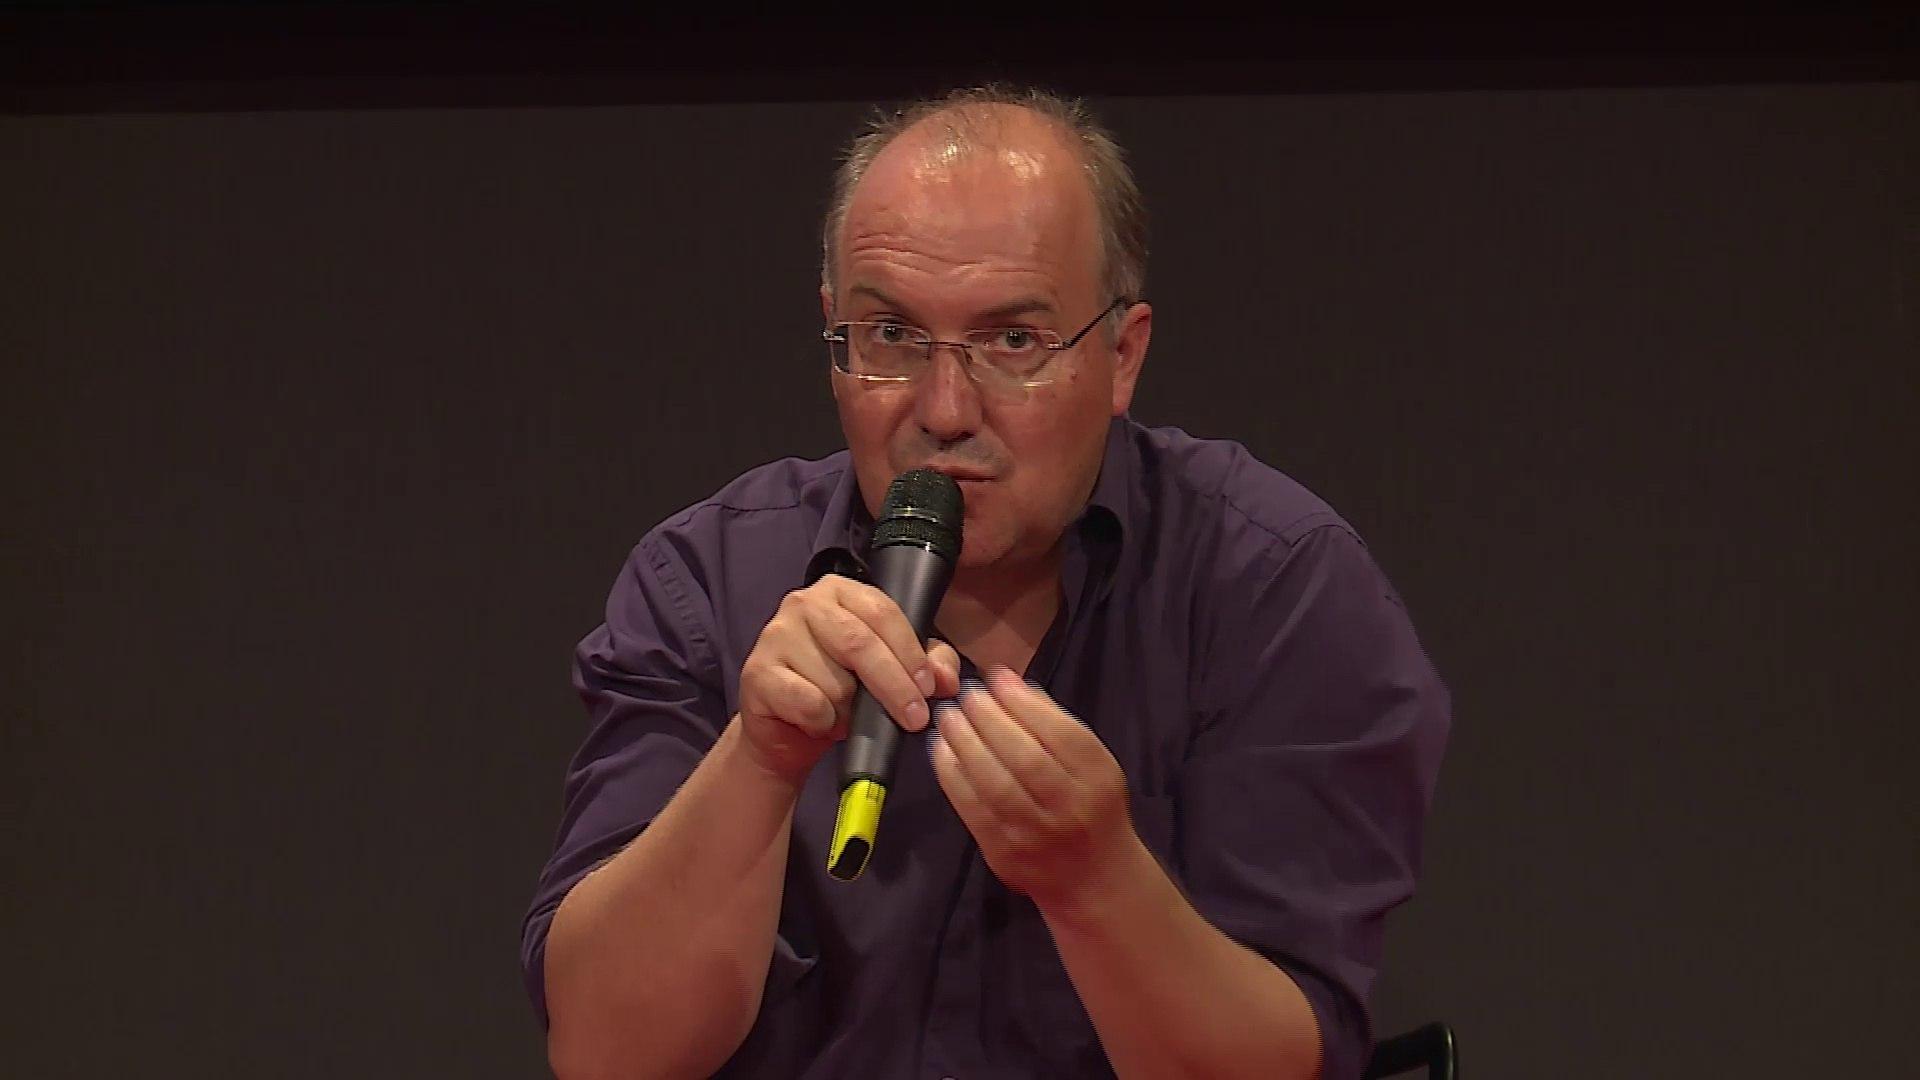 Science fiction and virtual reality - Alain Damasio